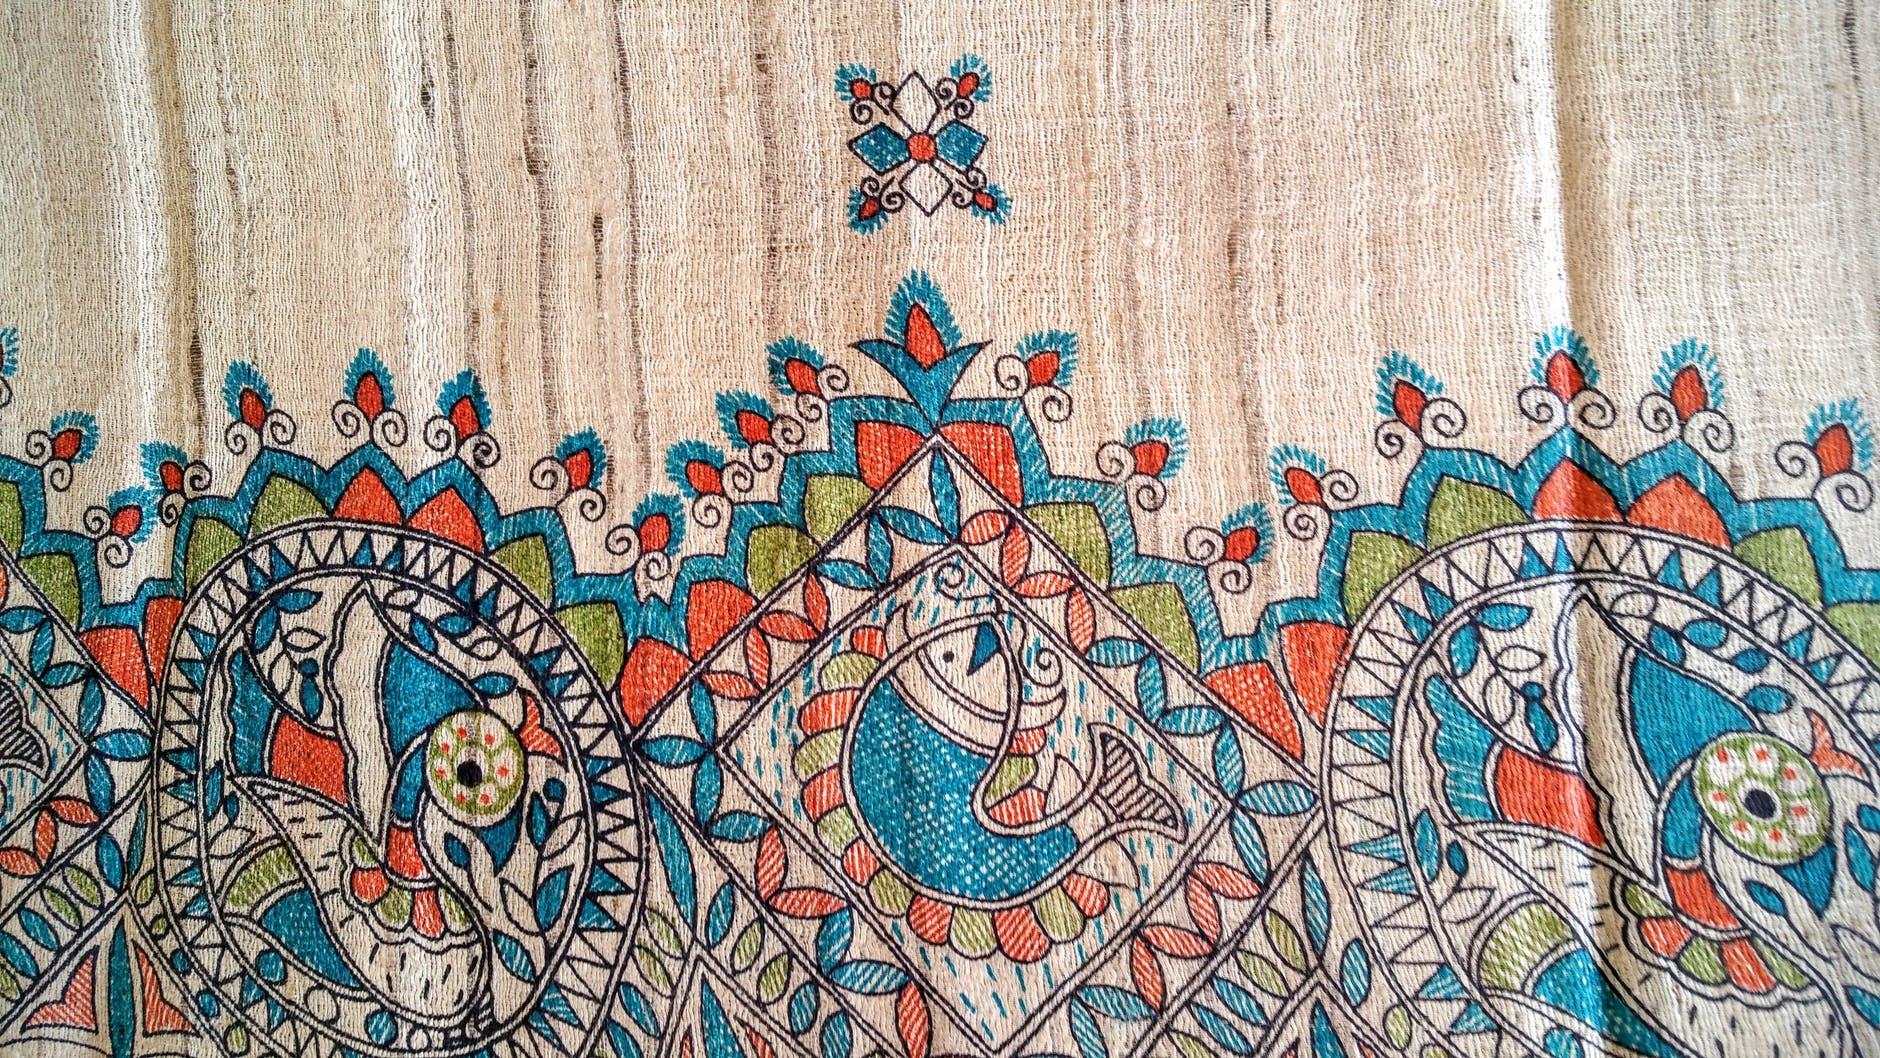 art artistic blue brown